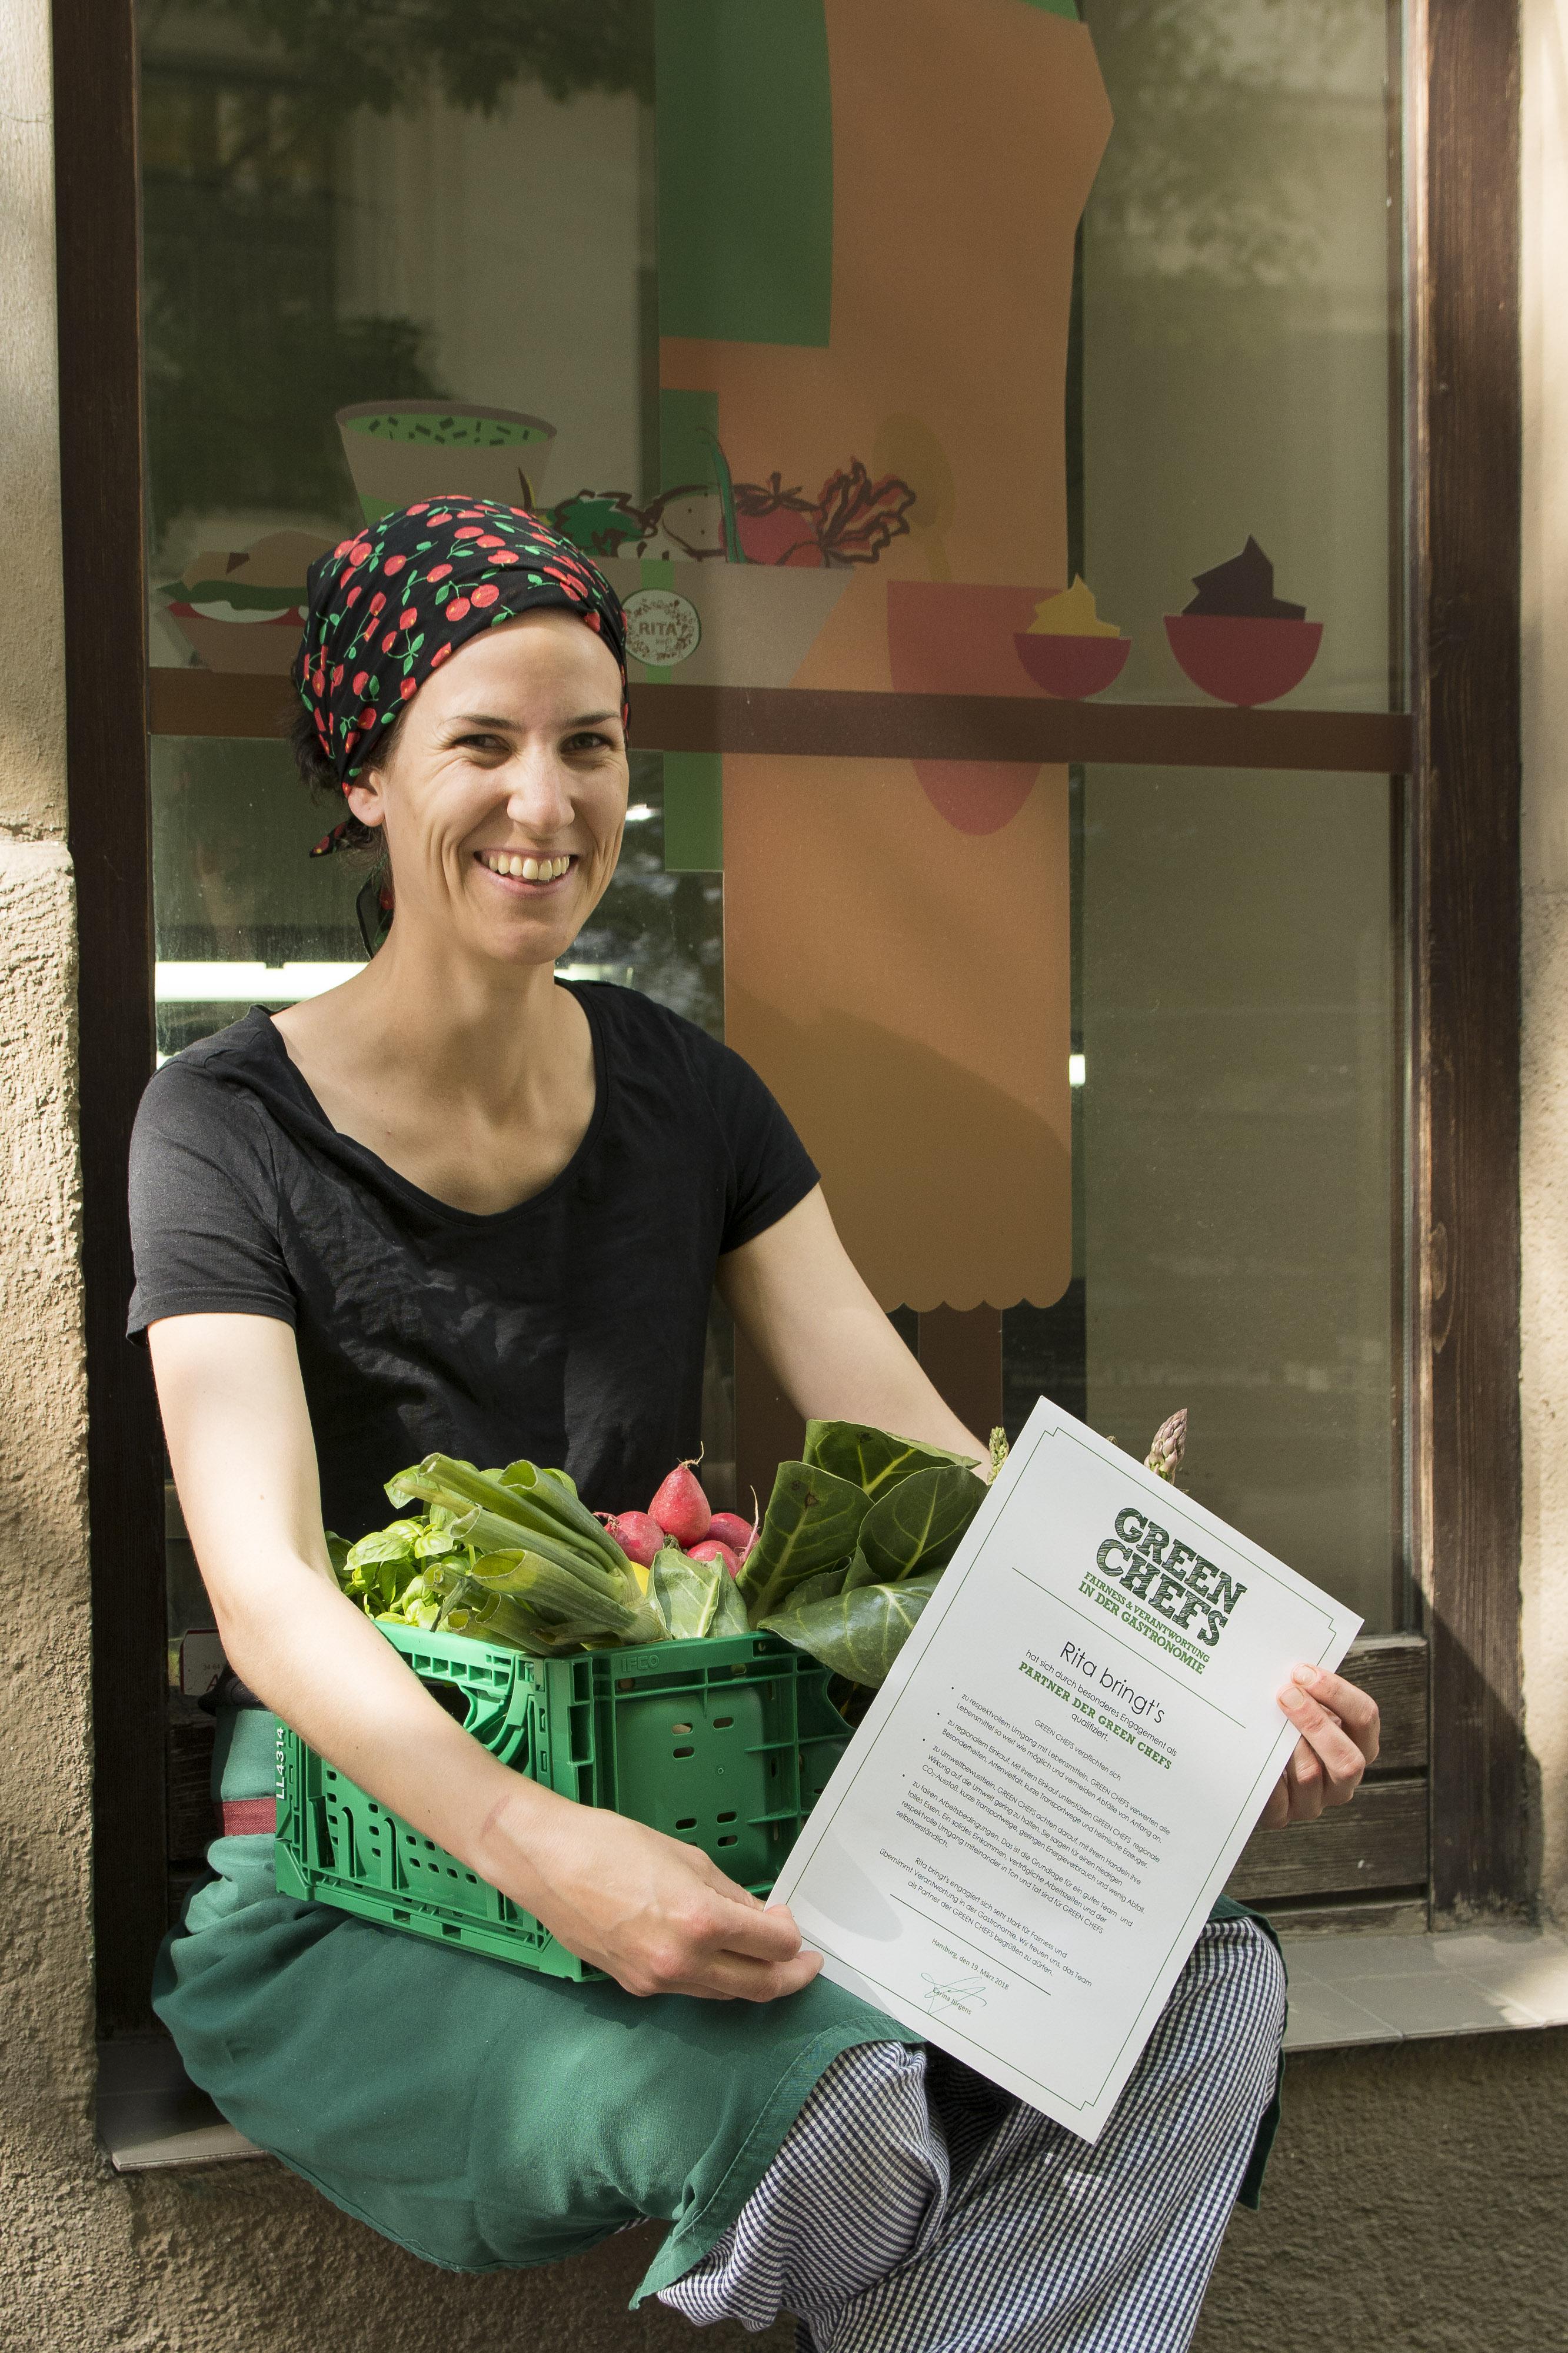 rita_green_chefs.jpg